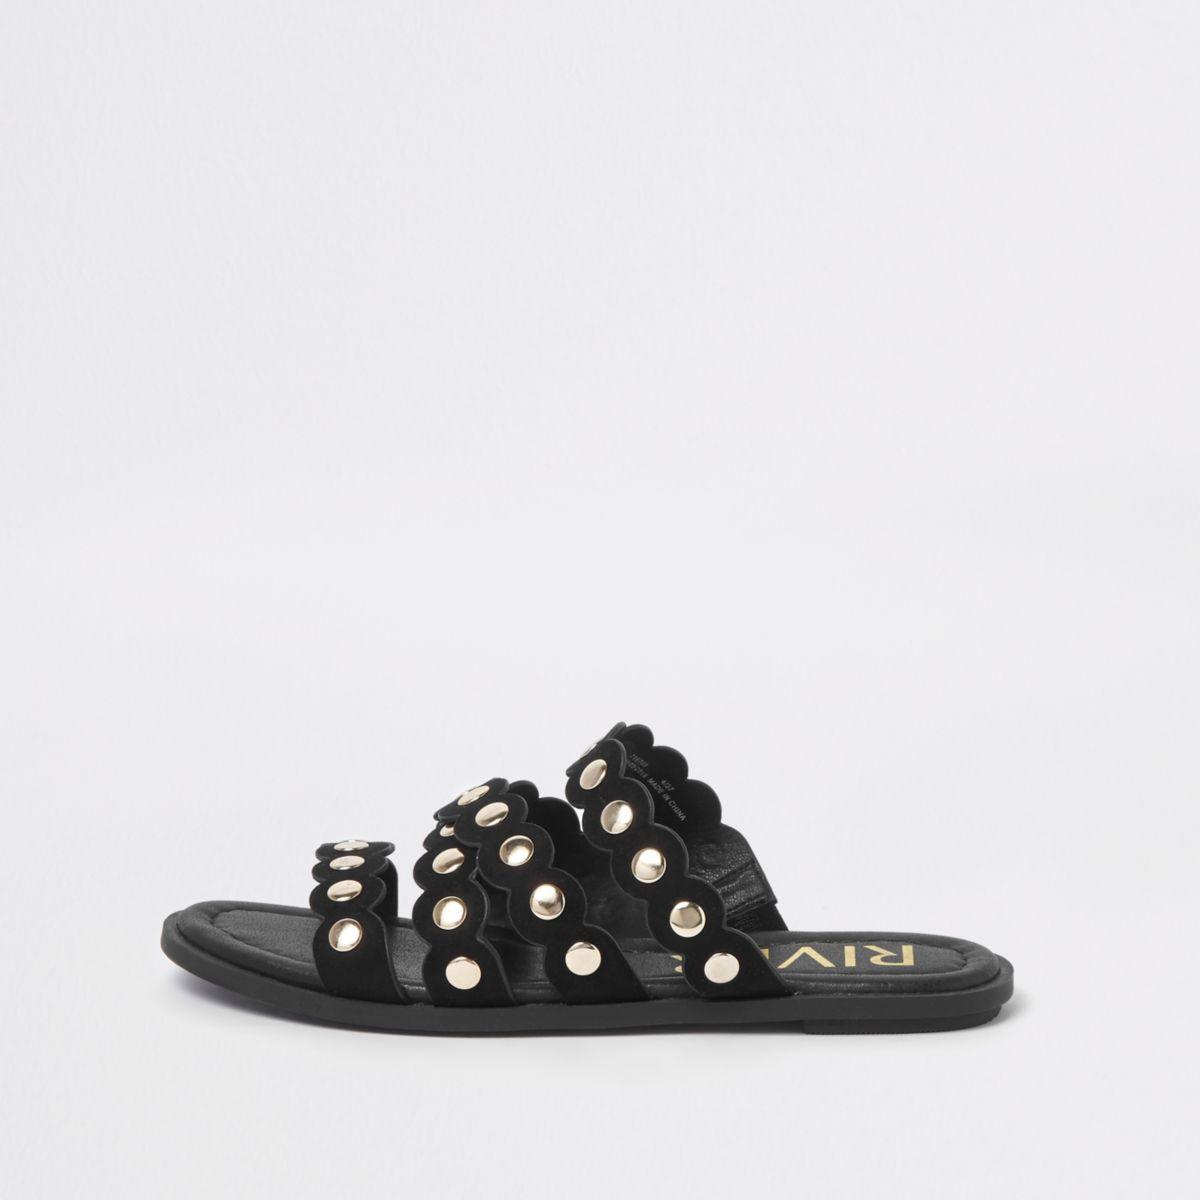 Black scallop studded mule sandals